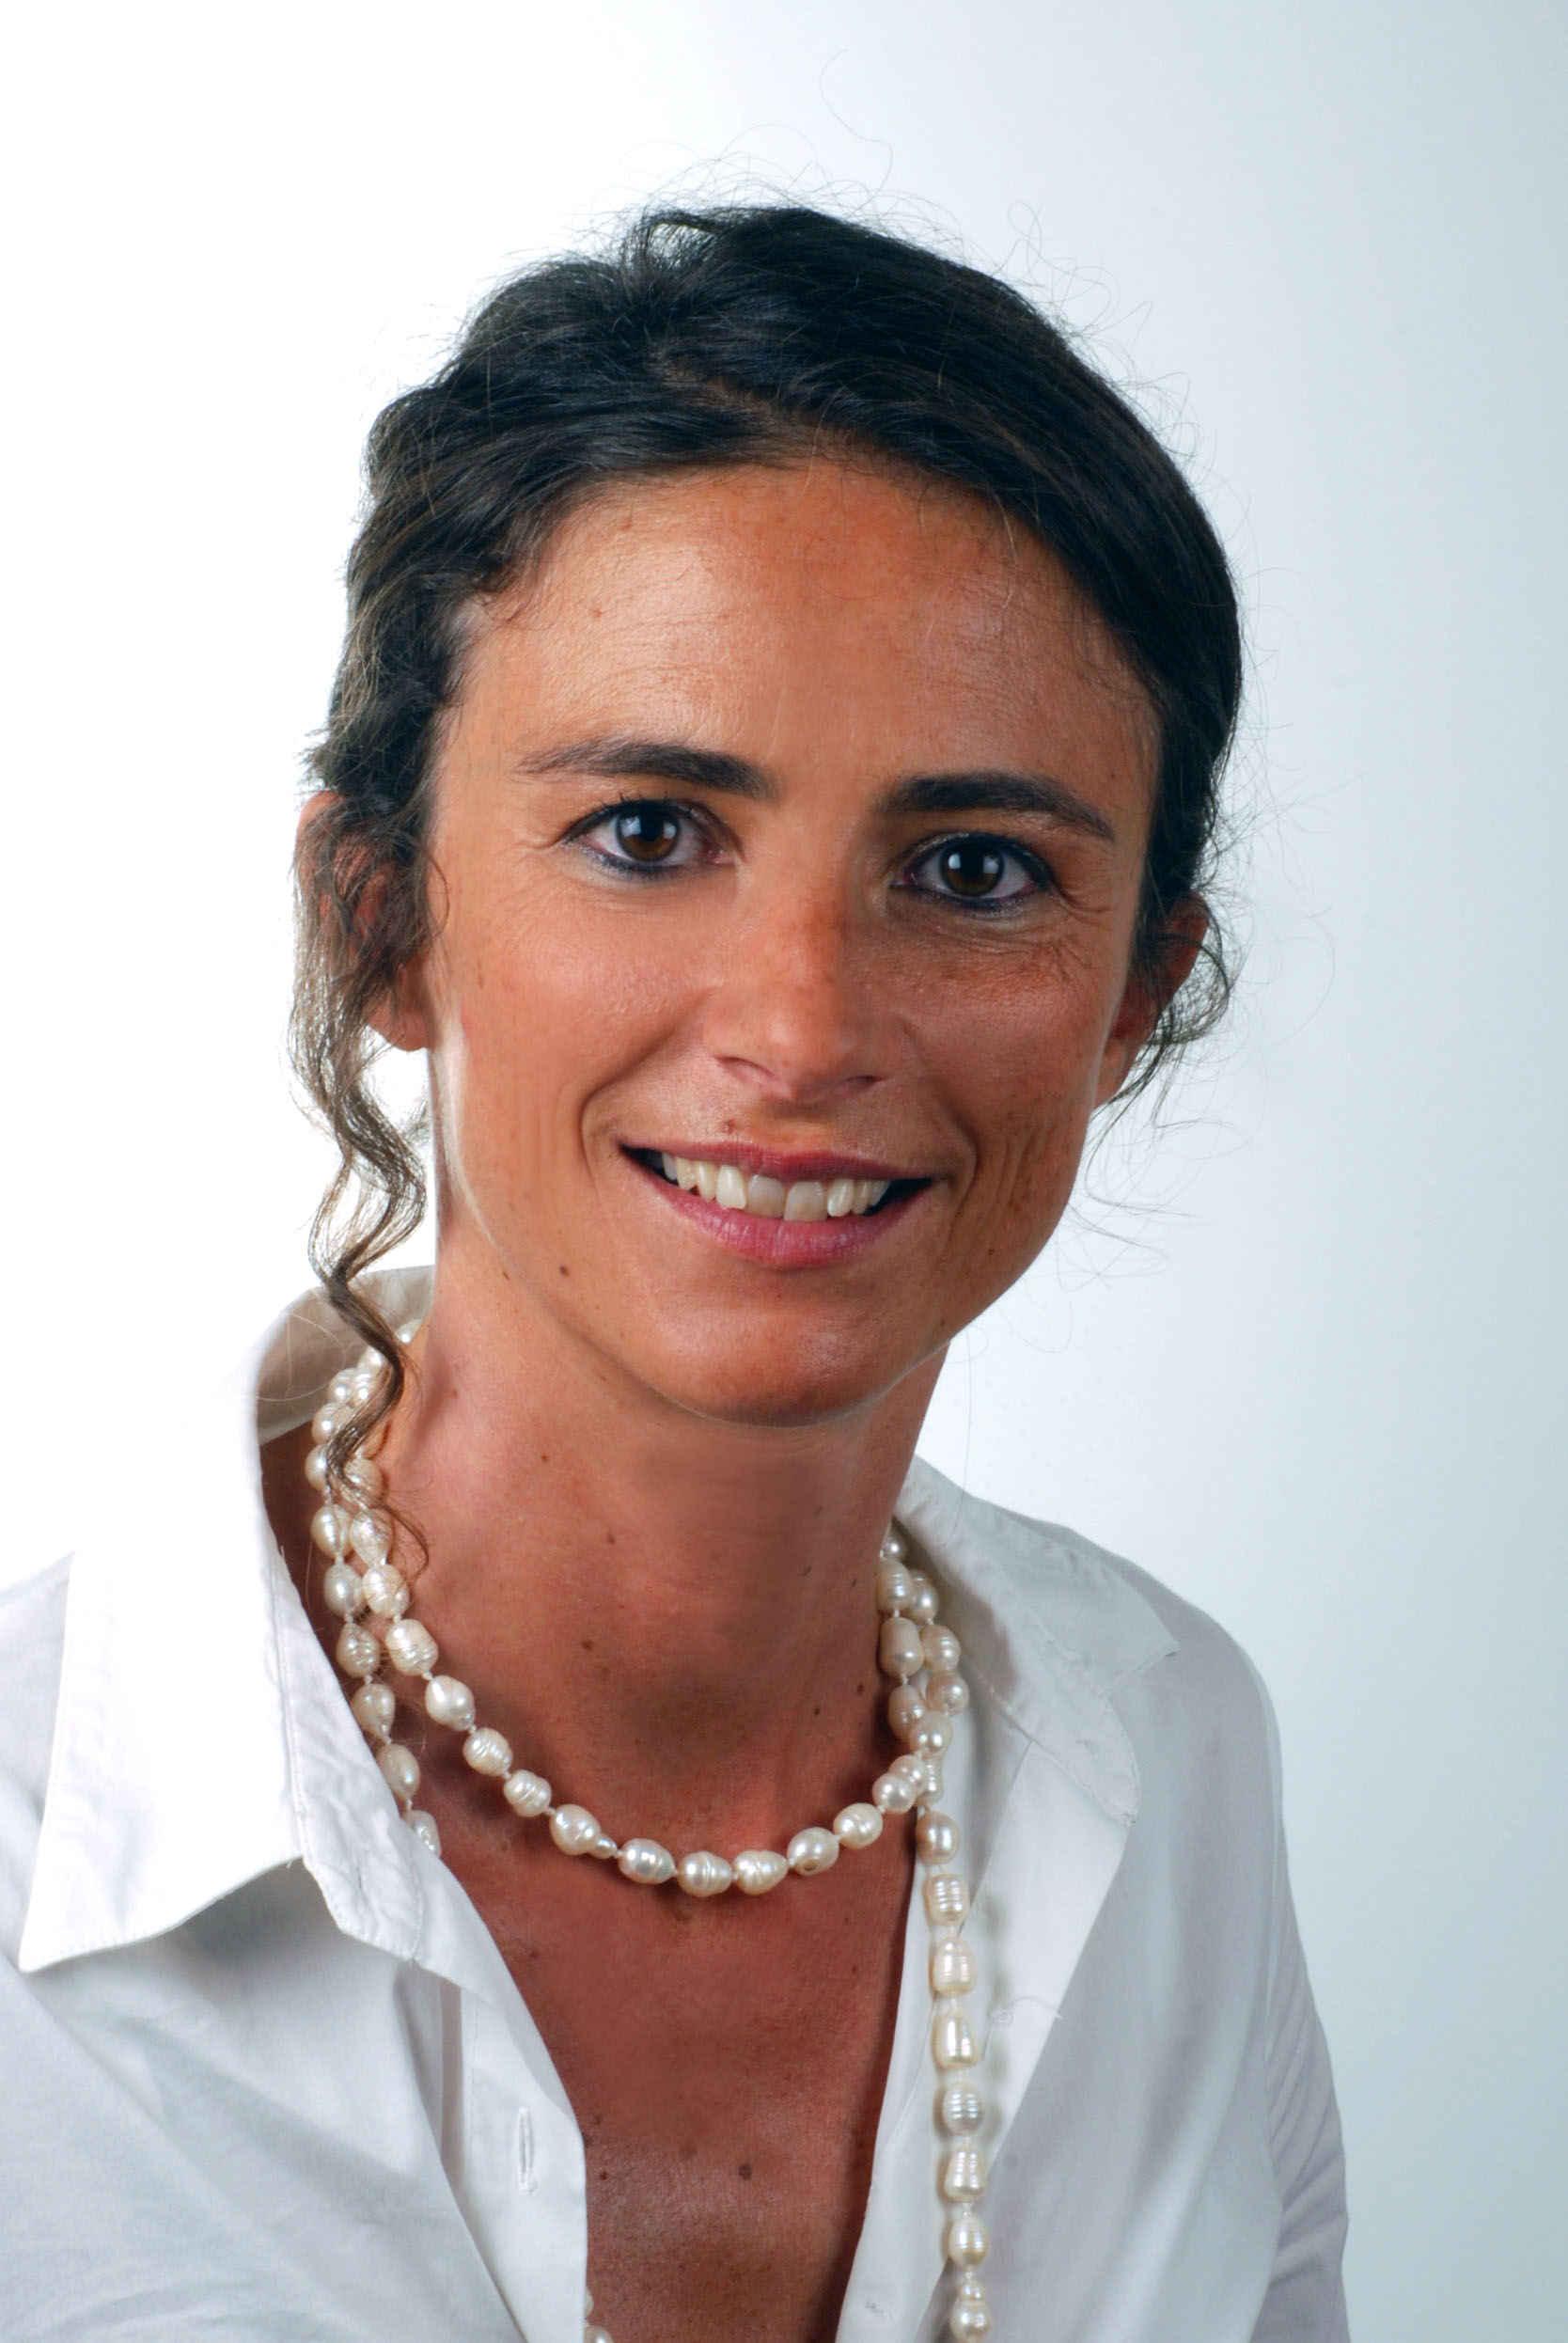 Chiara Ferrari Iau